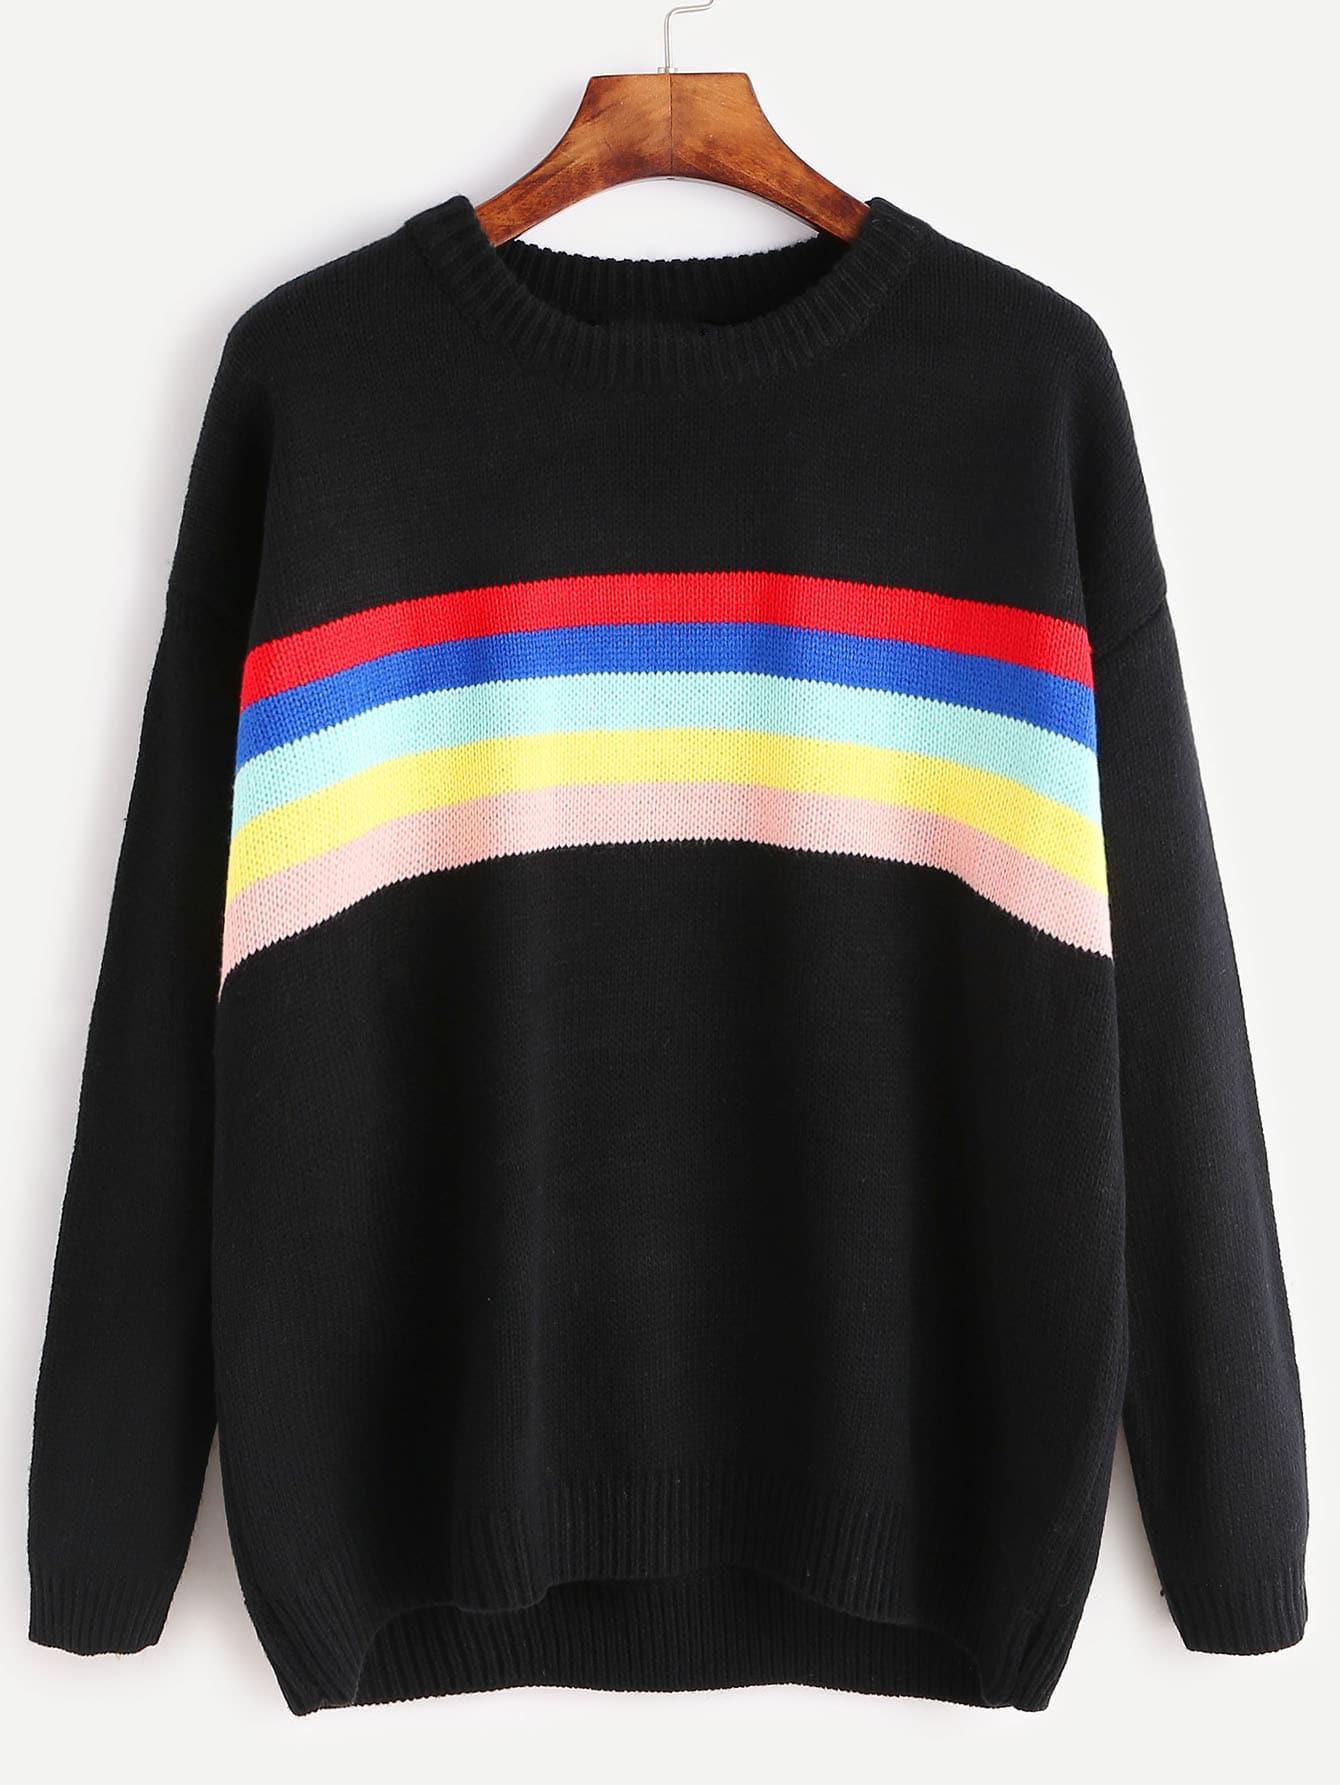 Black Dropped Shoulder Seam Rainbow Striped Sweater